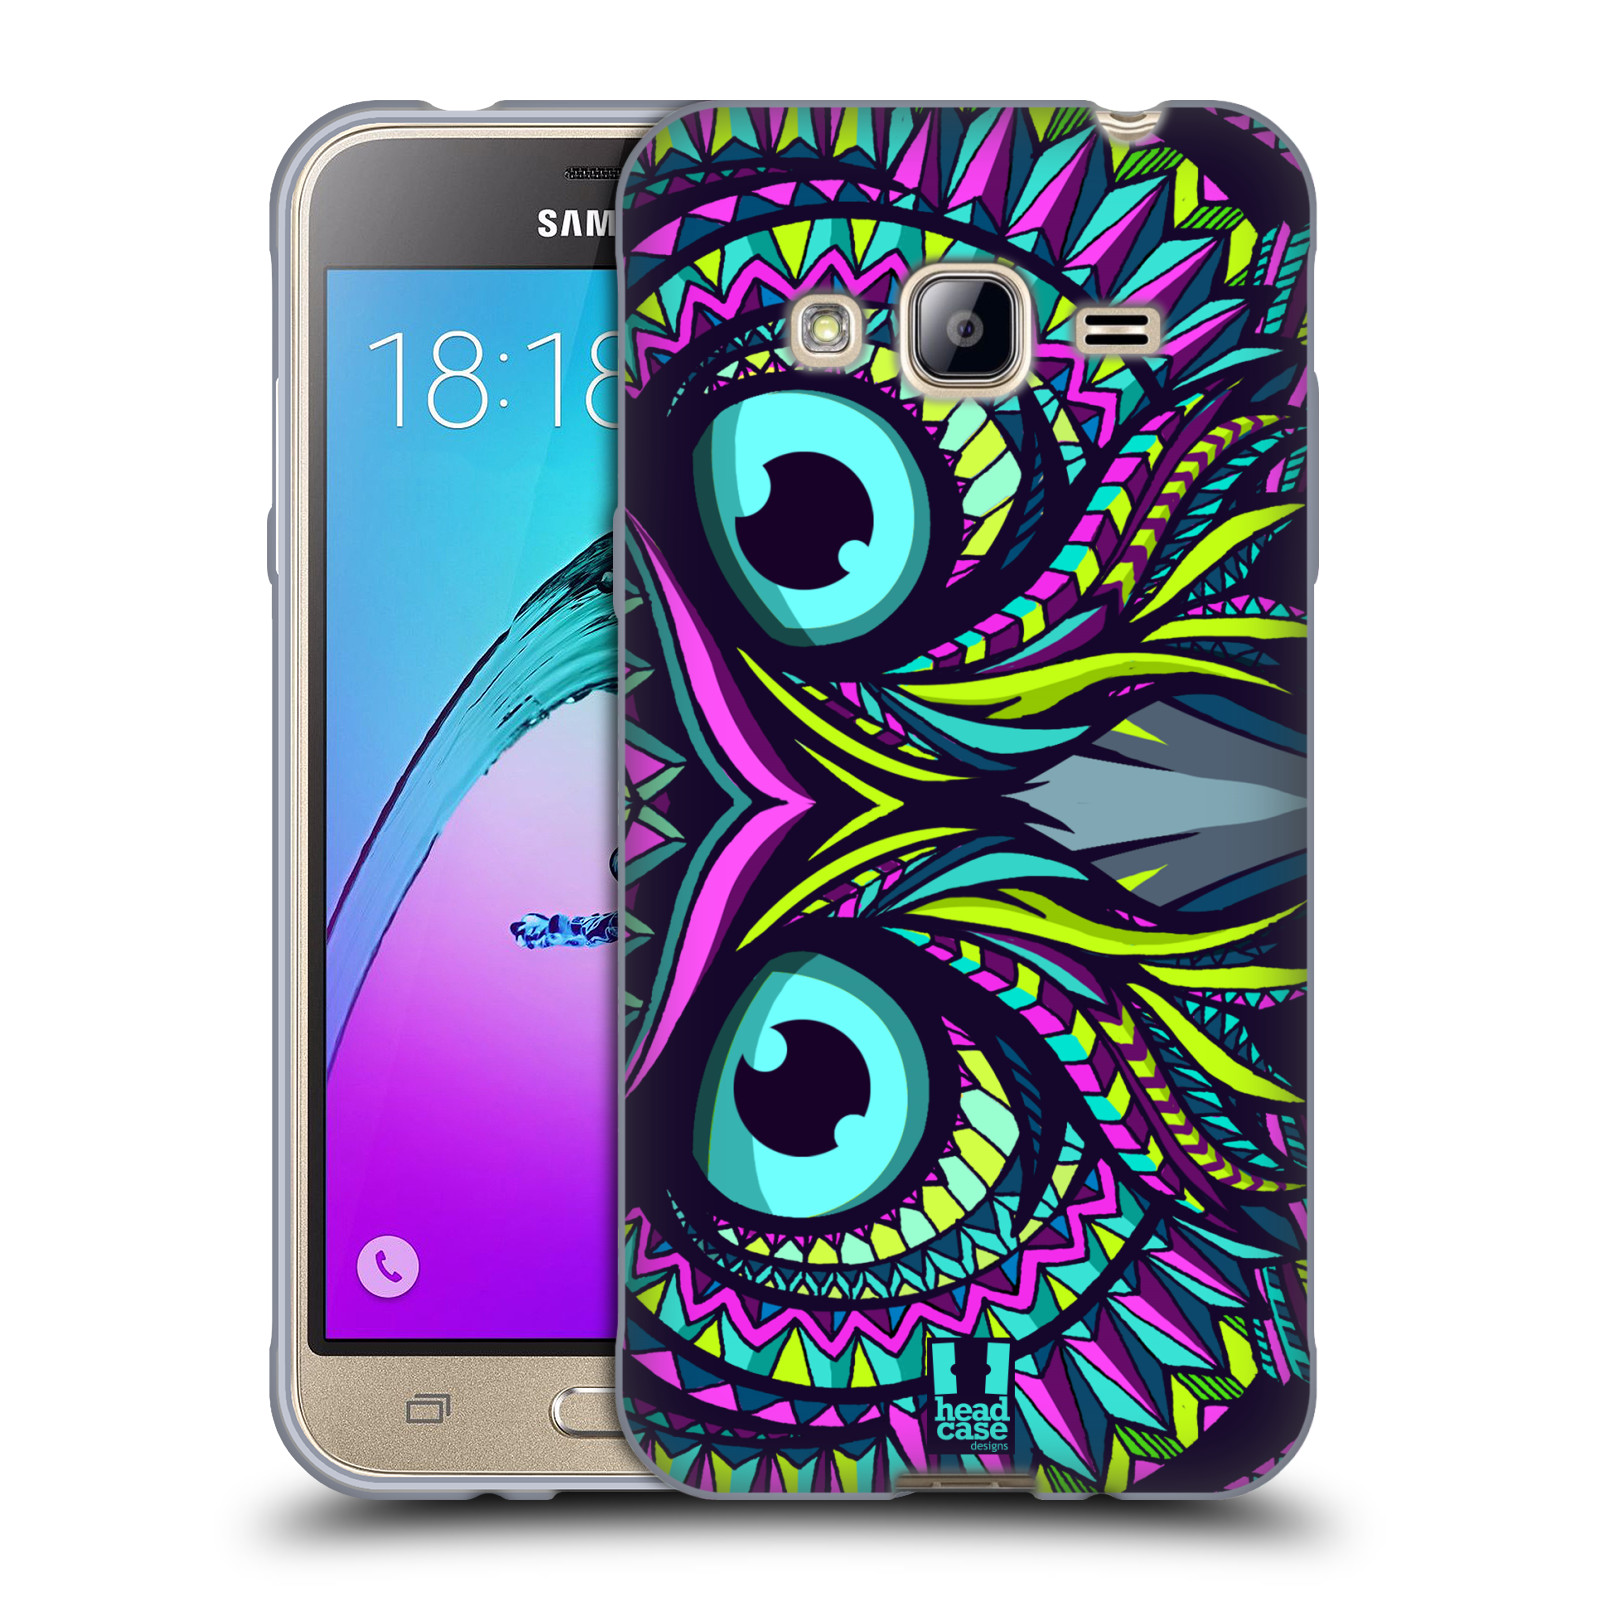 HEAD CASE silikonový obal na mobil Samsung Galaxy J3, J3 2016 vzor Aztécký motiv zvíře sova